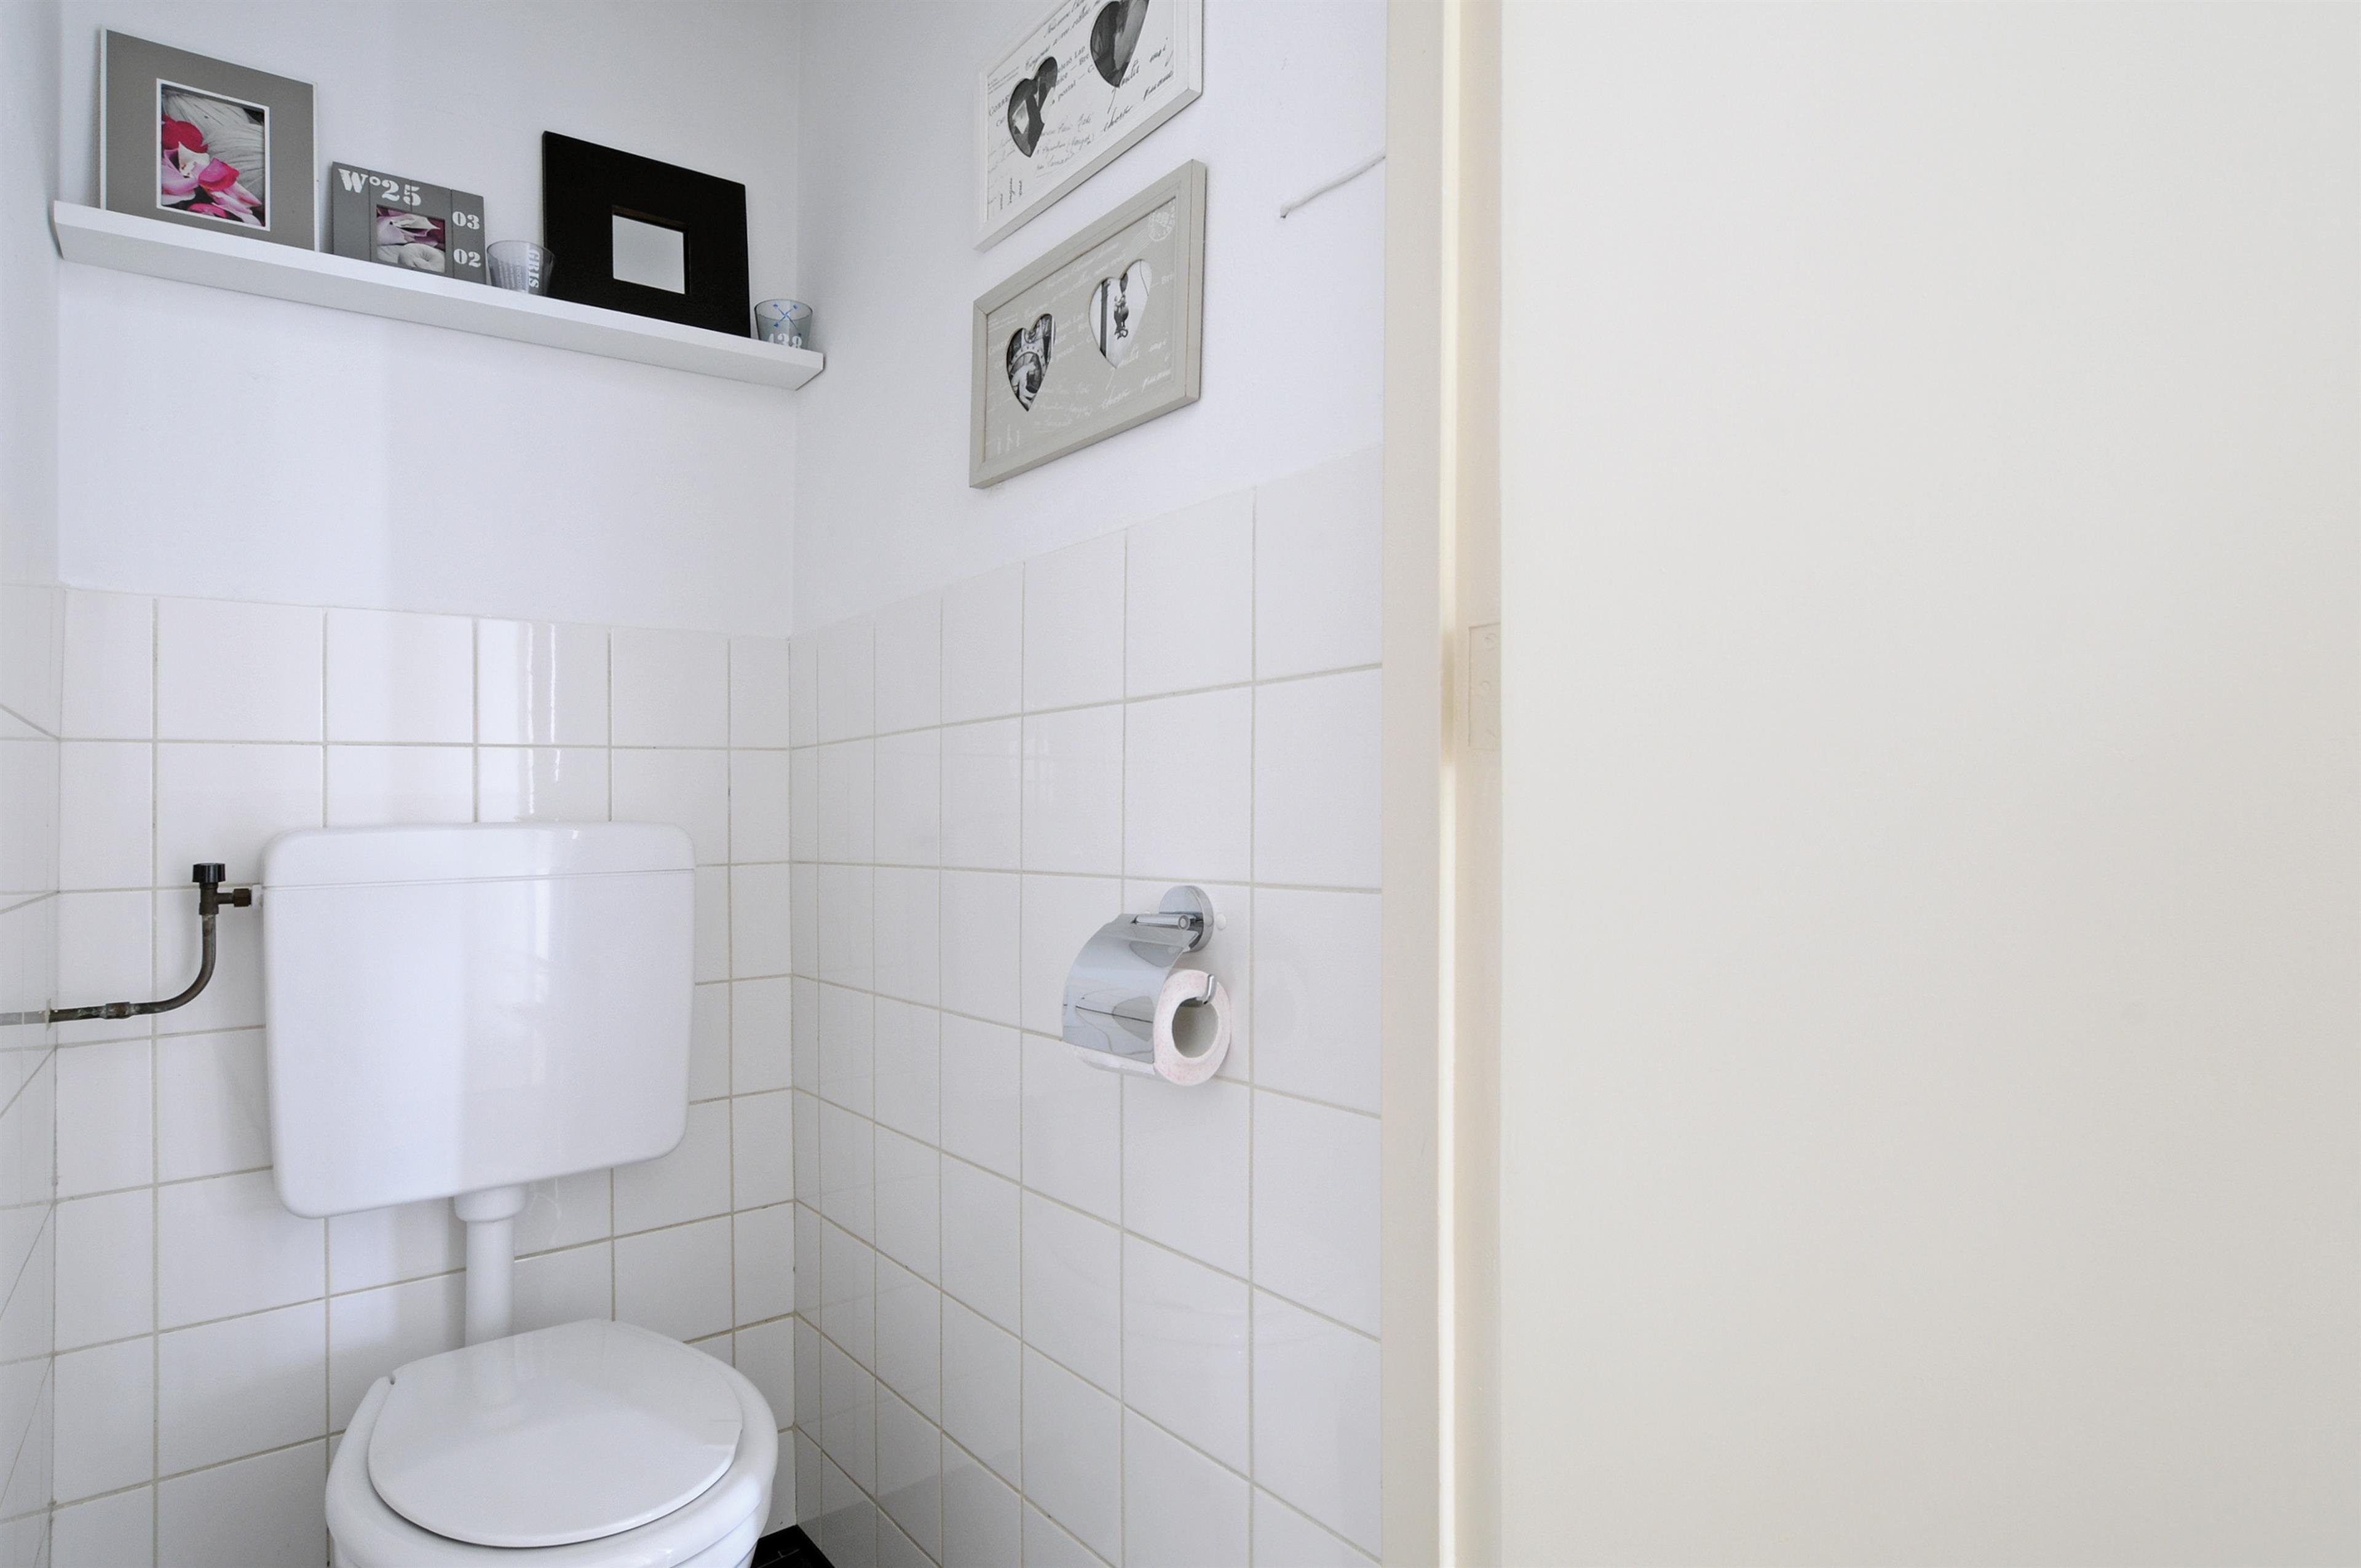 Nieuwe badkamer kop 4943212 - comotratarejaculacaoprecoce.info